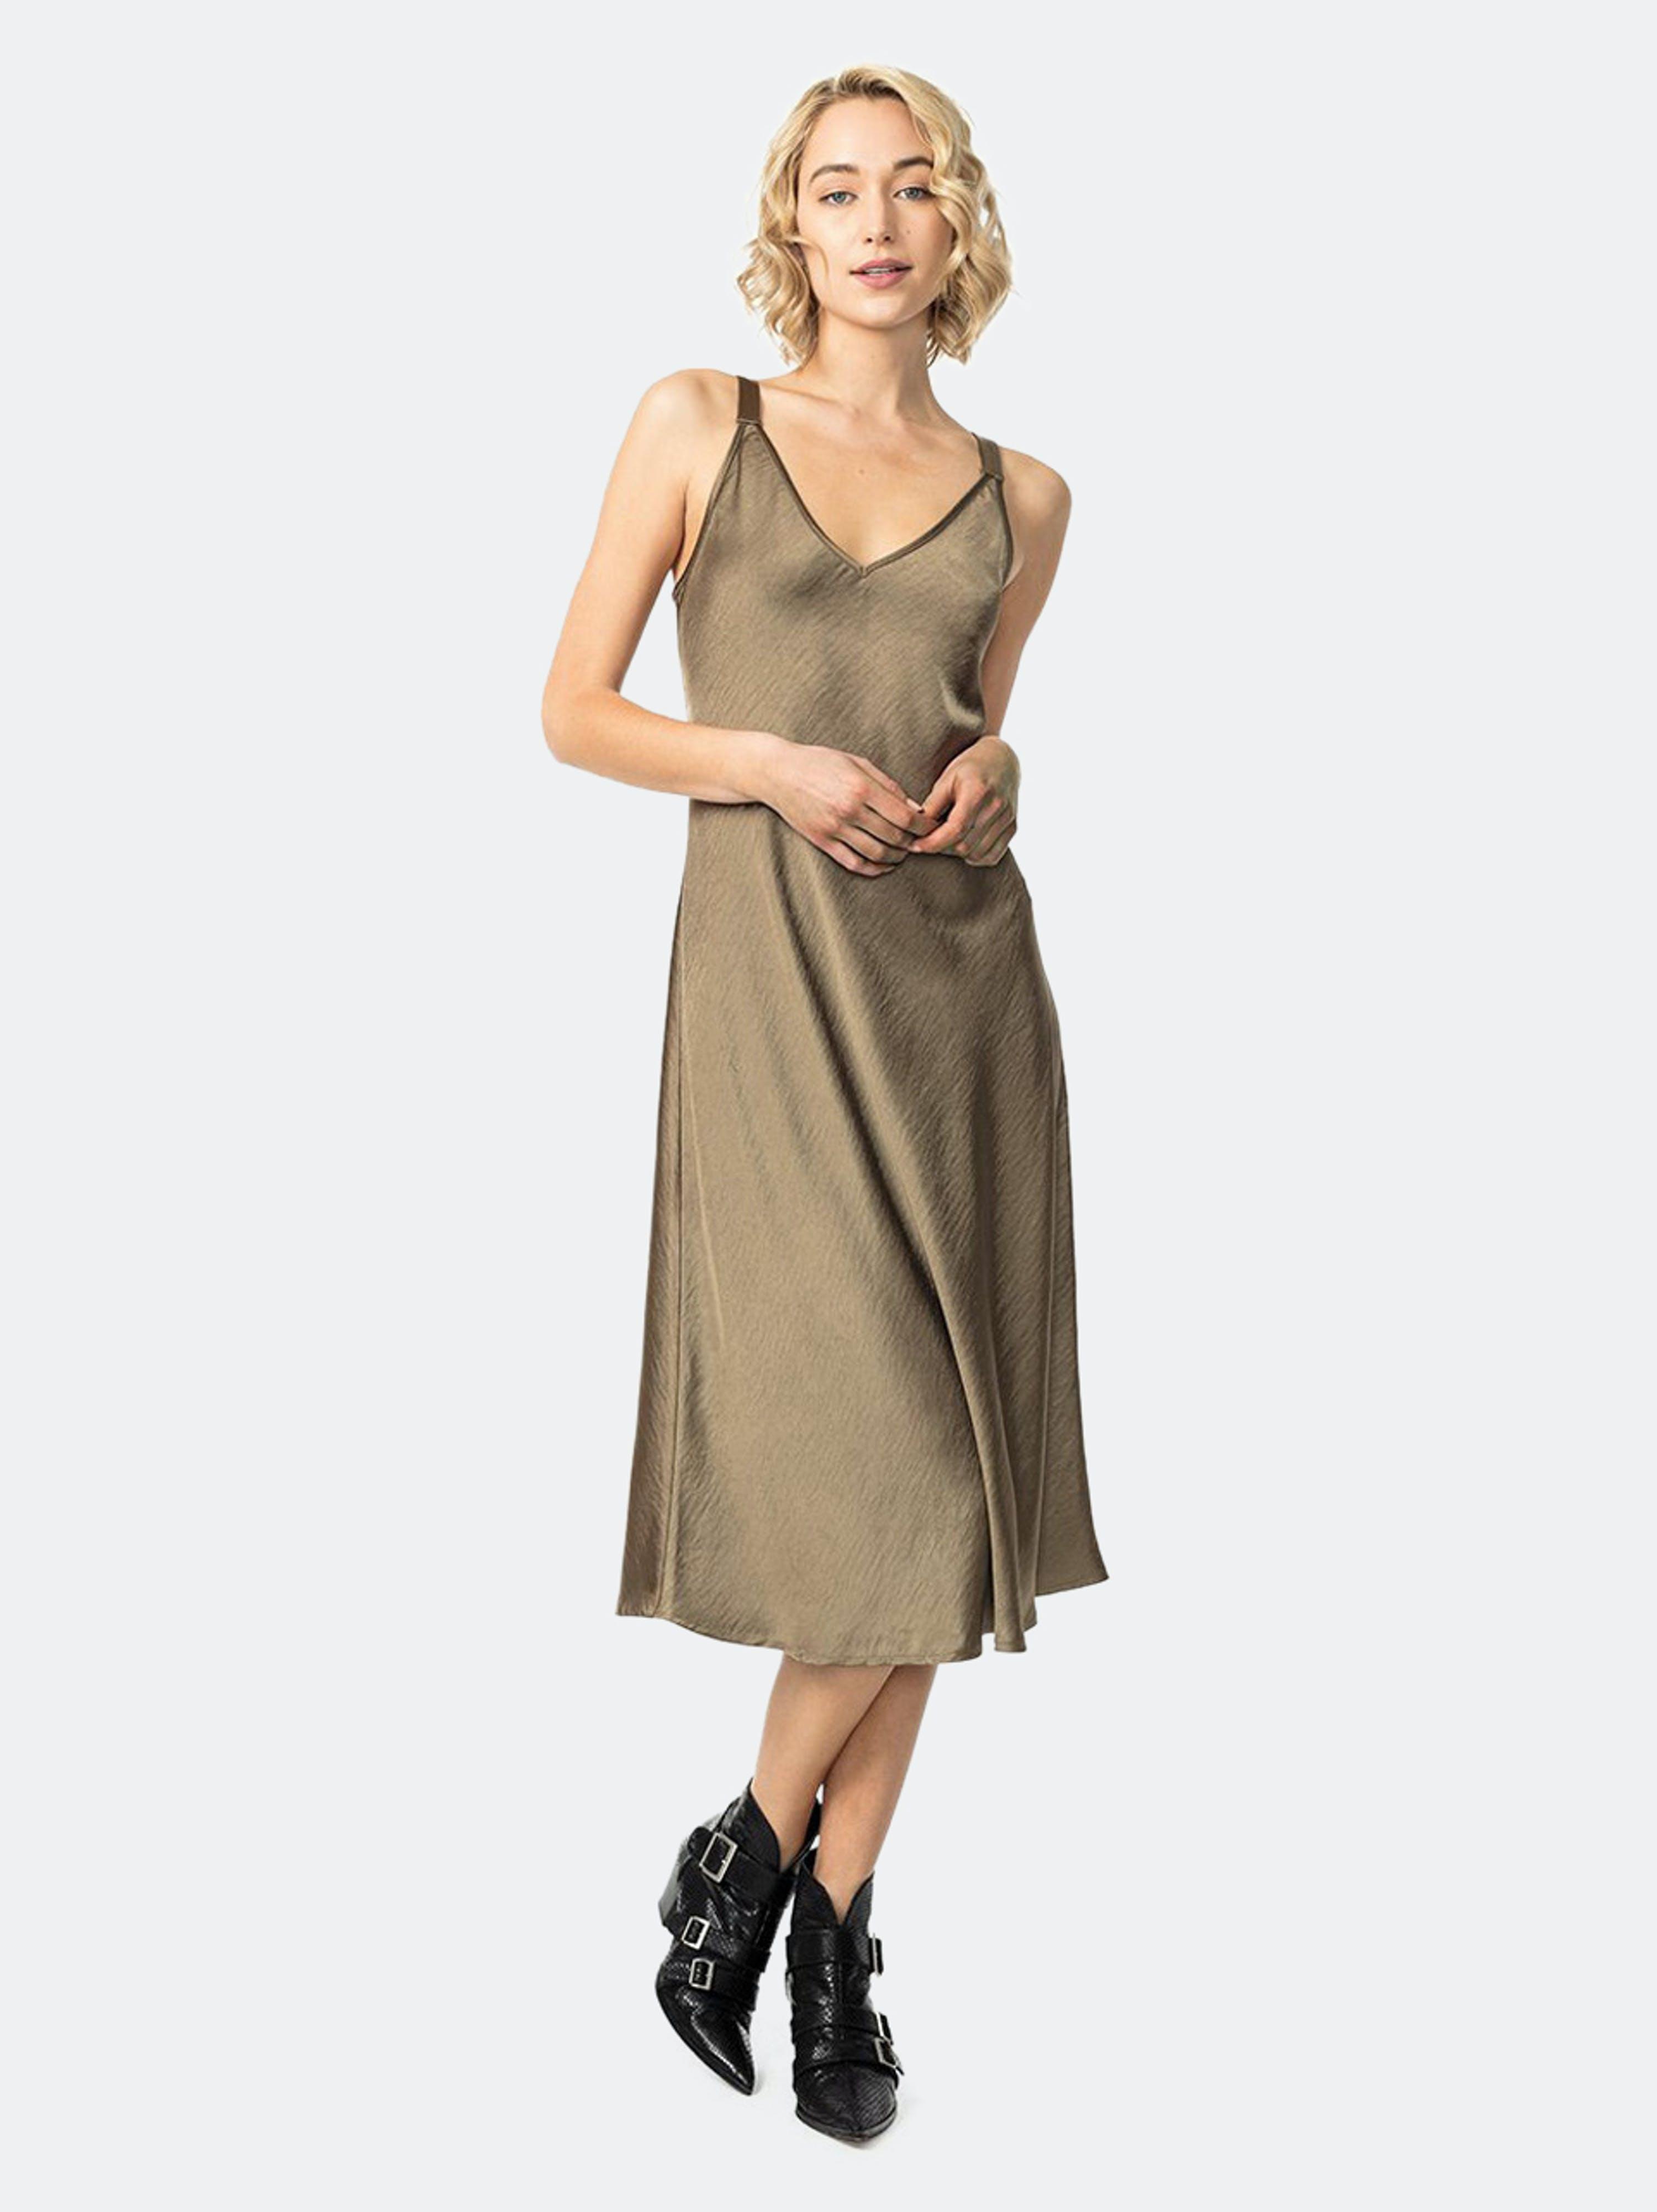 Astars Wellington Slip Dress In Brown